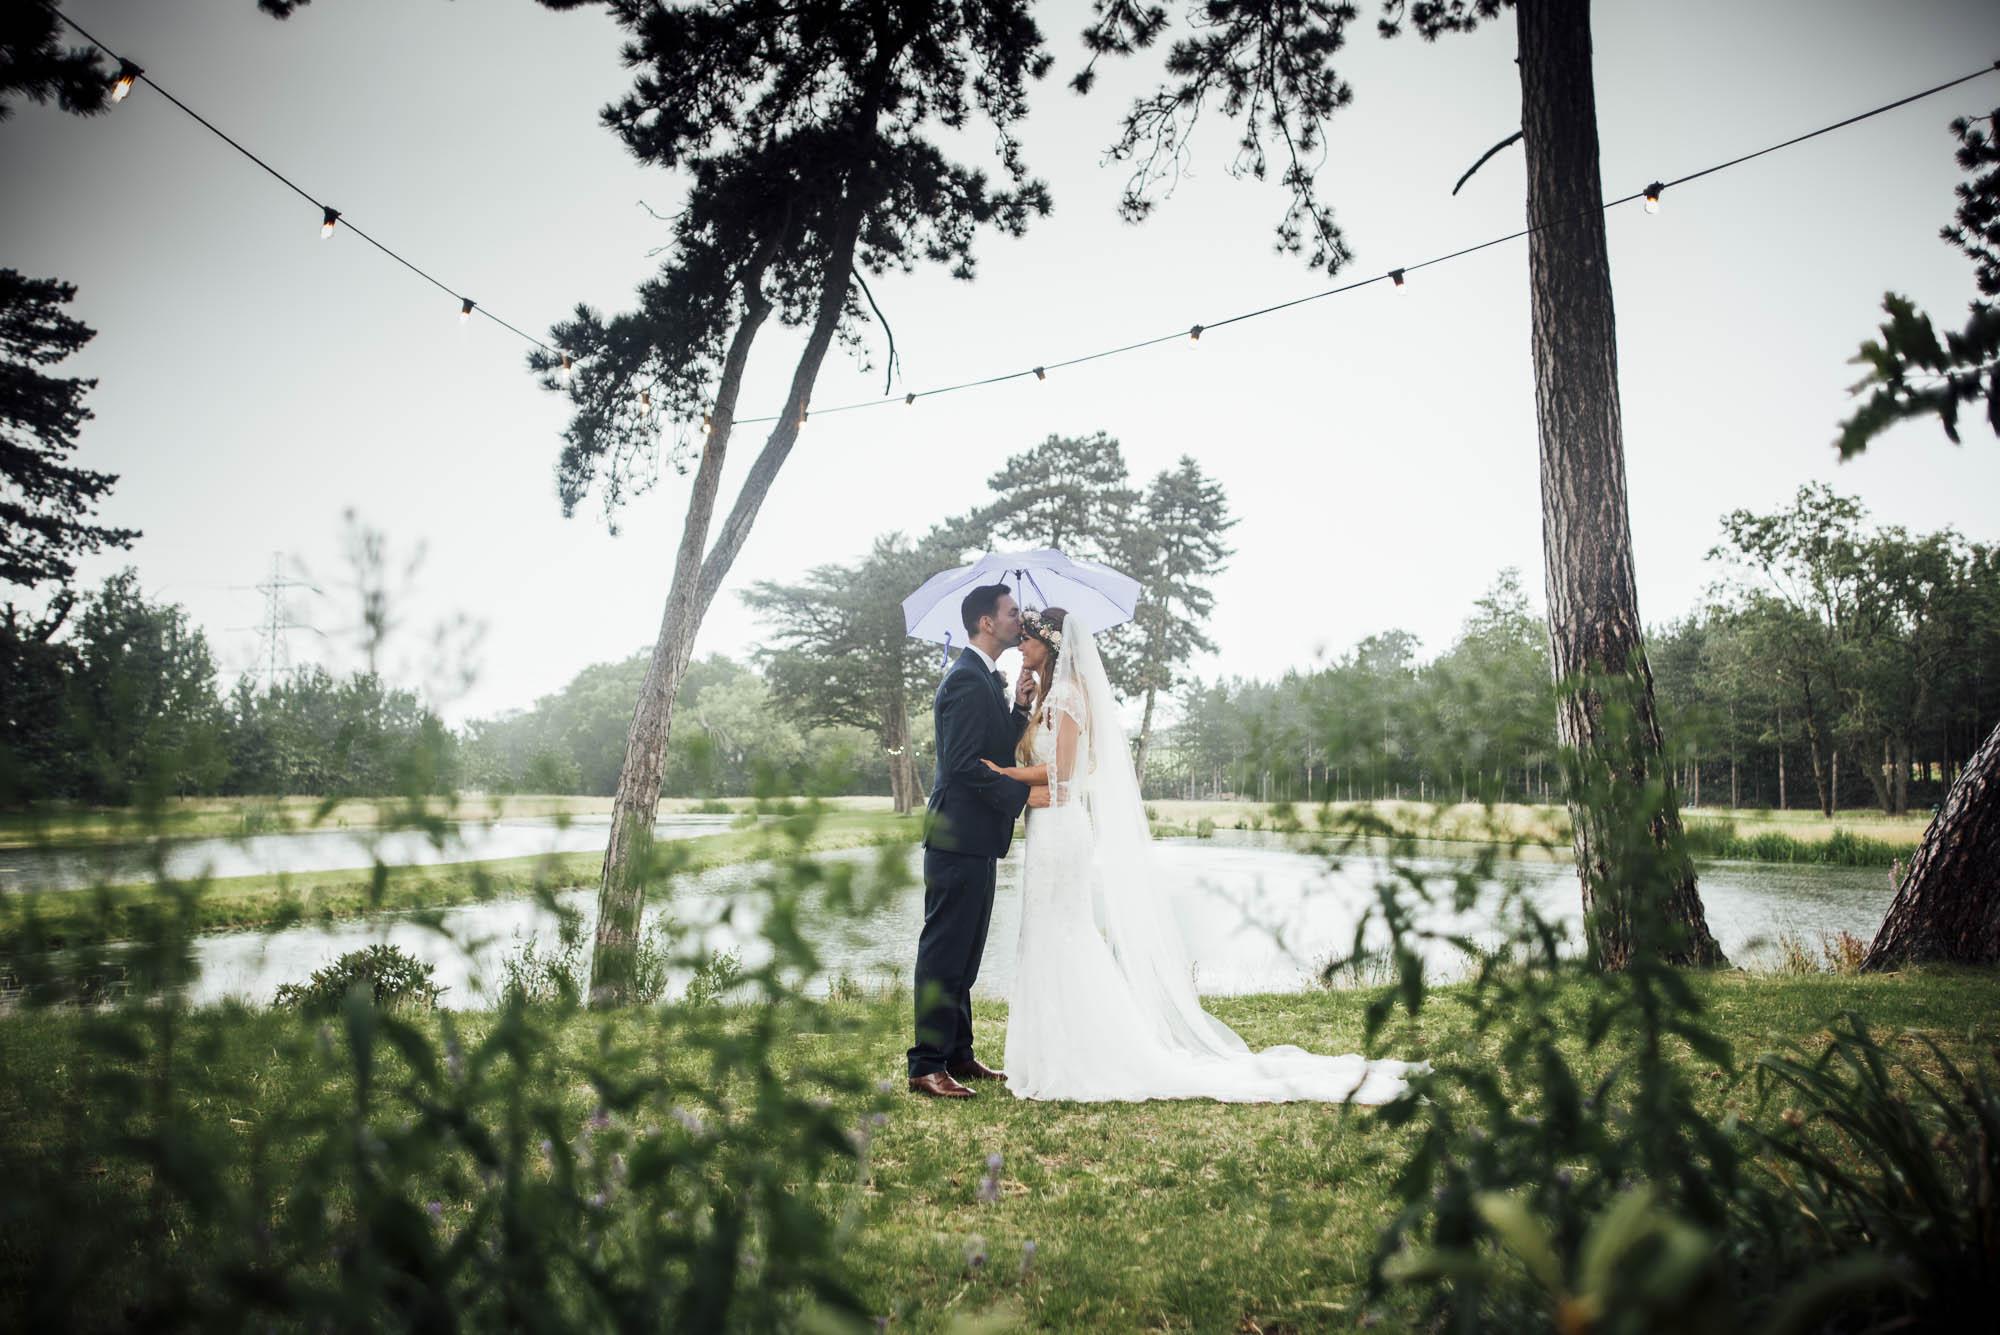 Bride & Groom on a rainy wedding day